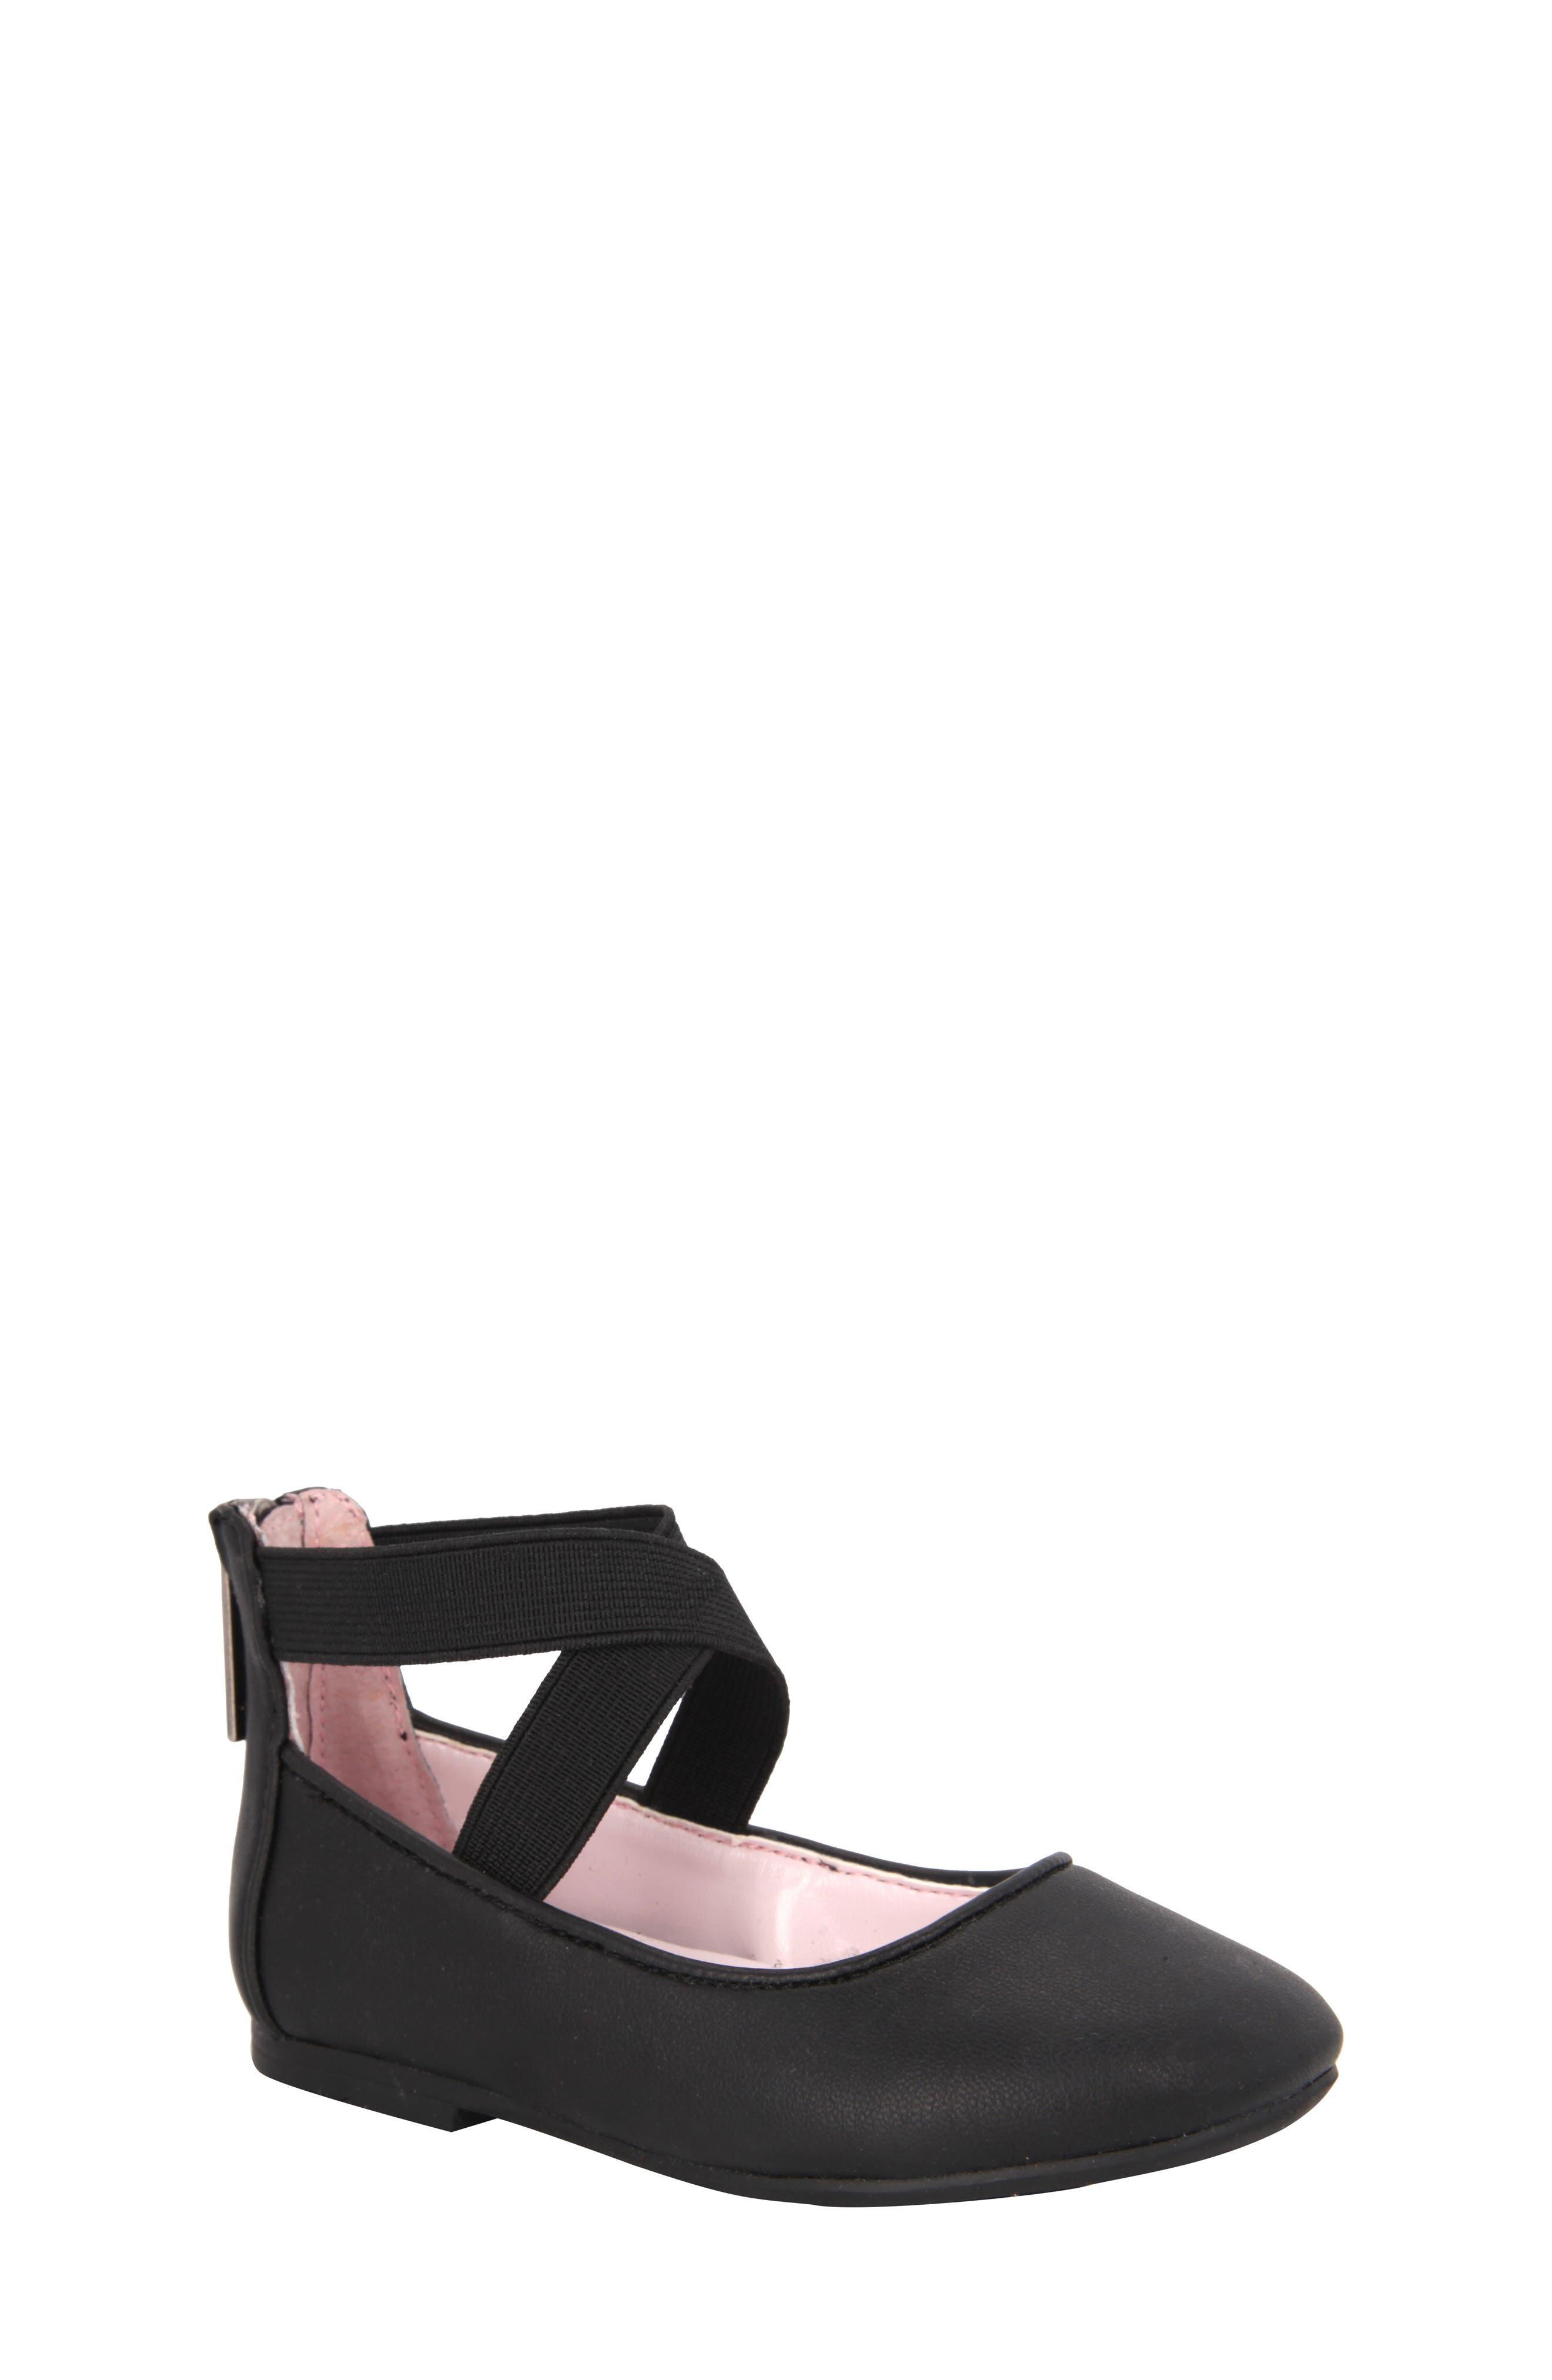 Marissa Cross Strap Flat,                         Main,                         color, Black Faux Leather